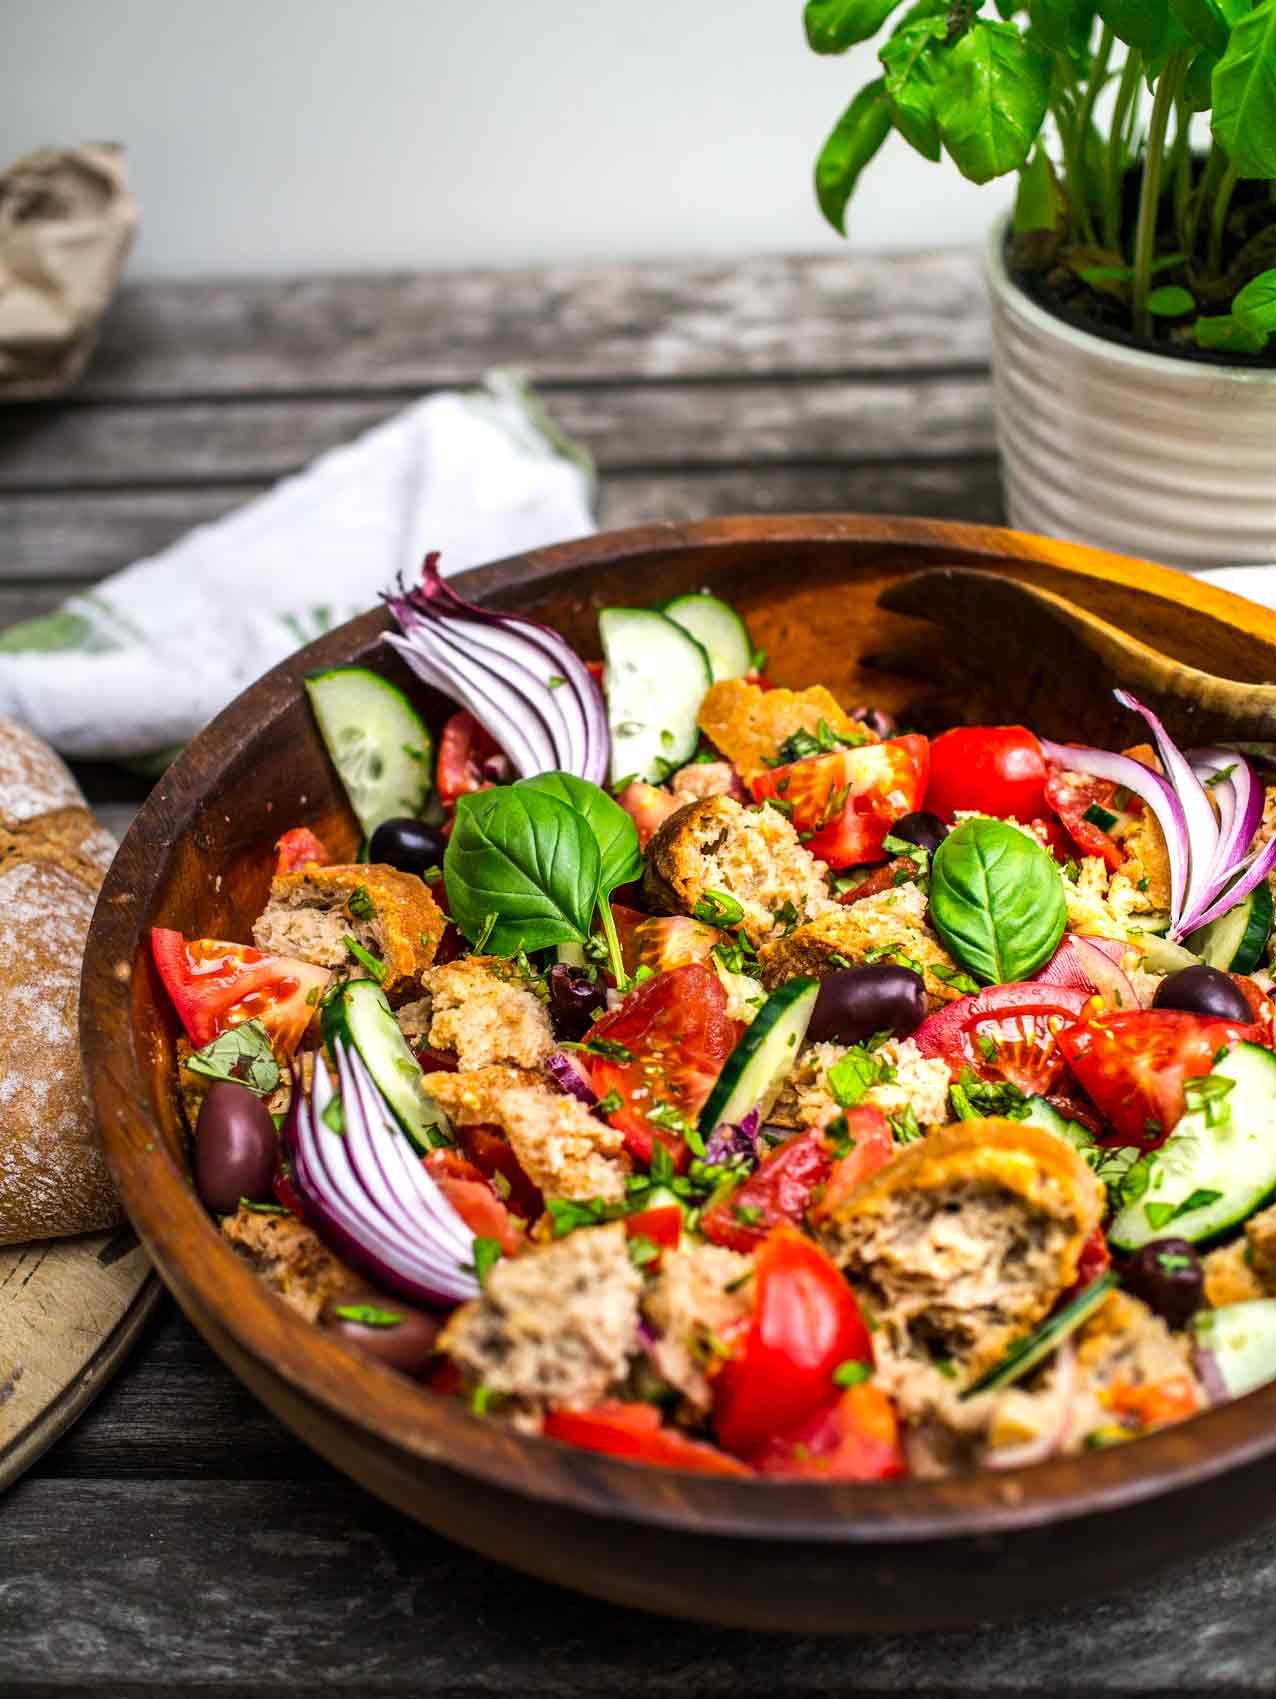 Panzanella || Discover Delicious || www.discoverdelicious.org || Vegan Food Blog